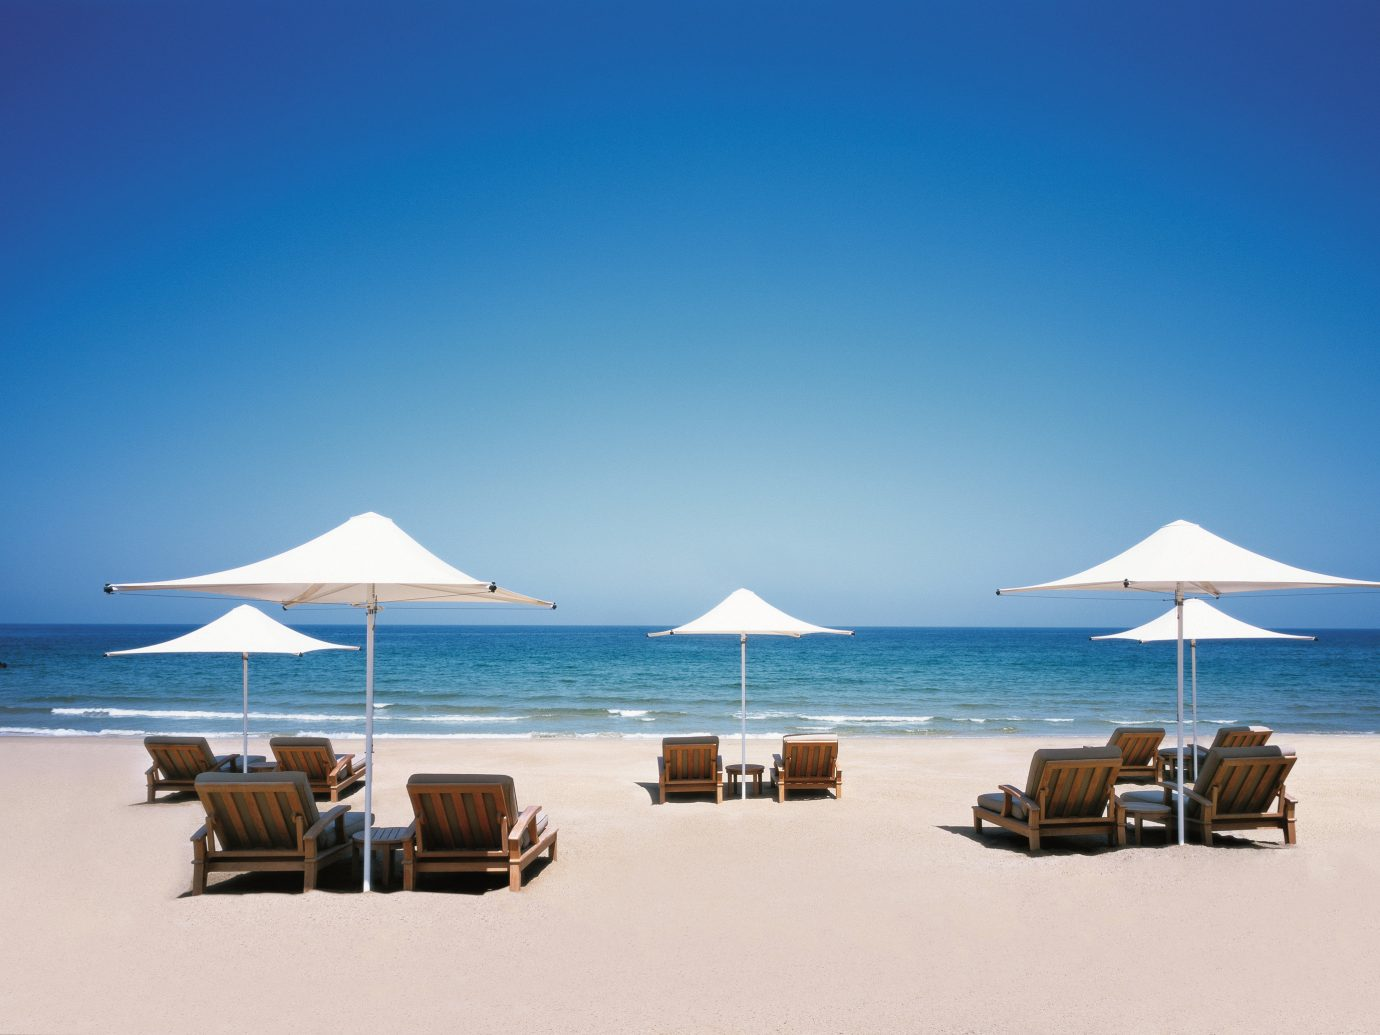 Trip Ideas umbrella sky chair water outdoor horizon Beach Sea Ocean lawn Coast Island shore shade furniture several day sandy